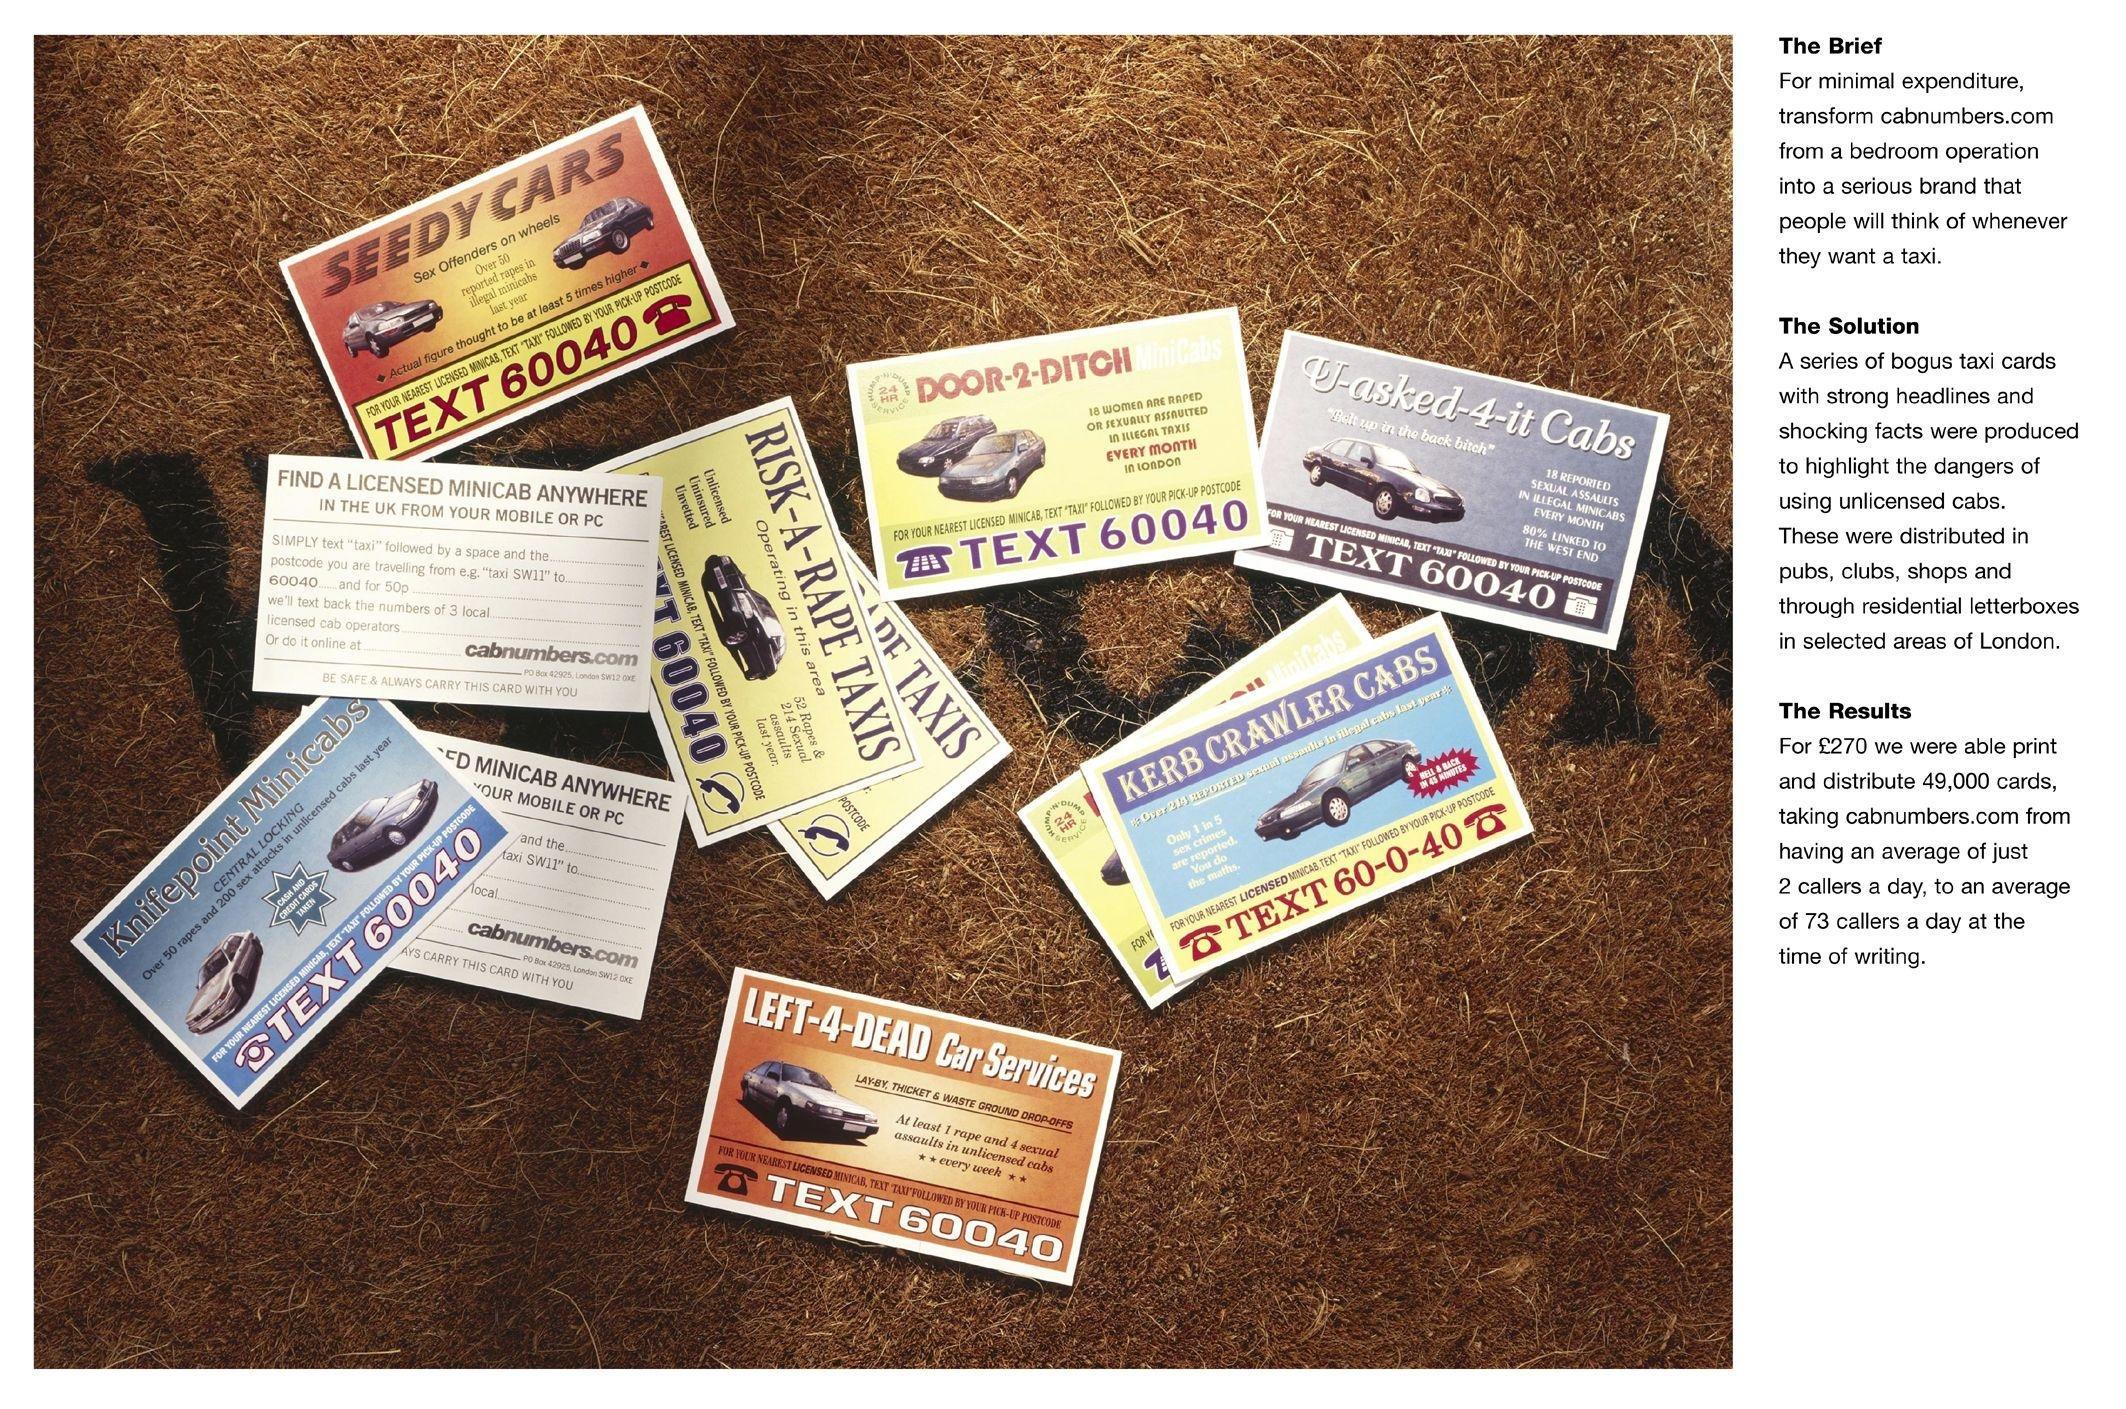 cabnumberscom-taxi-cards-original-66048.jpg